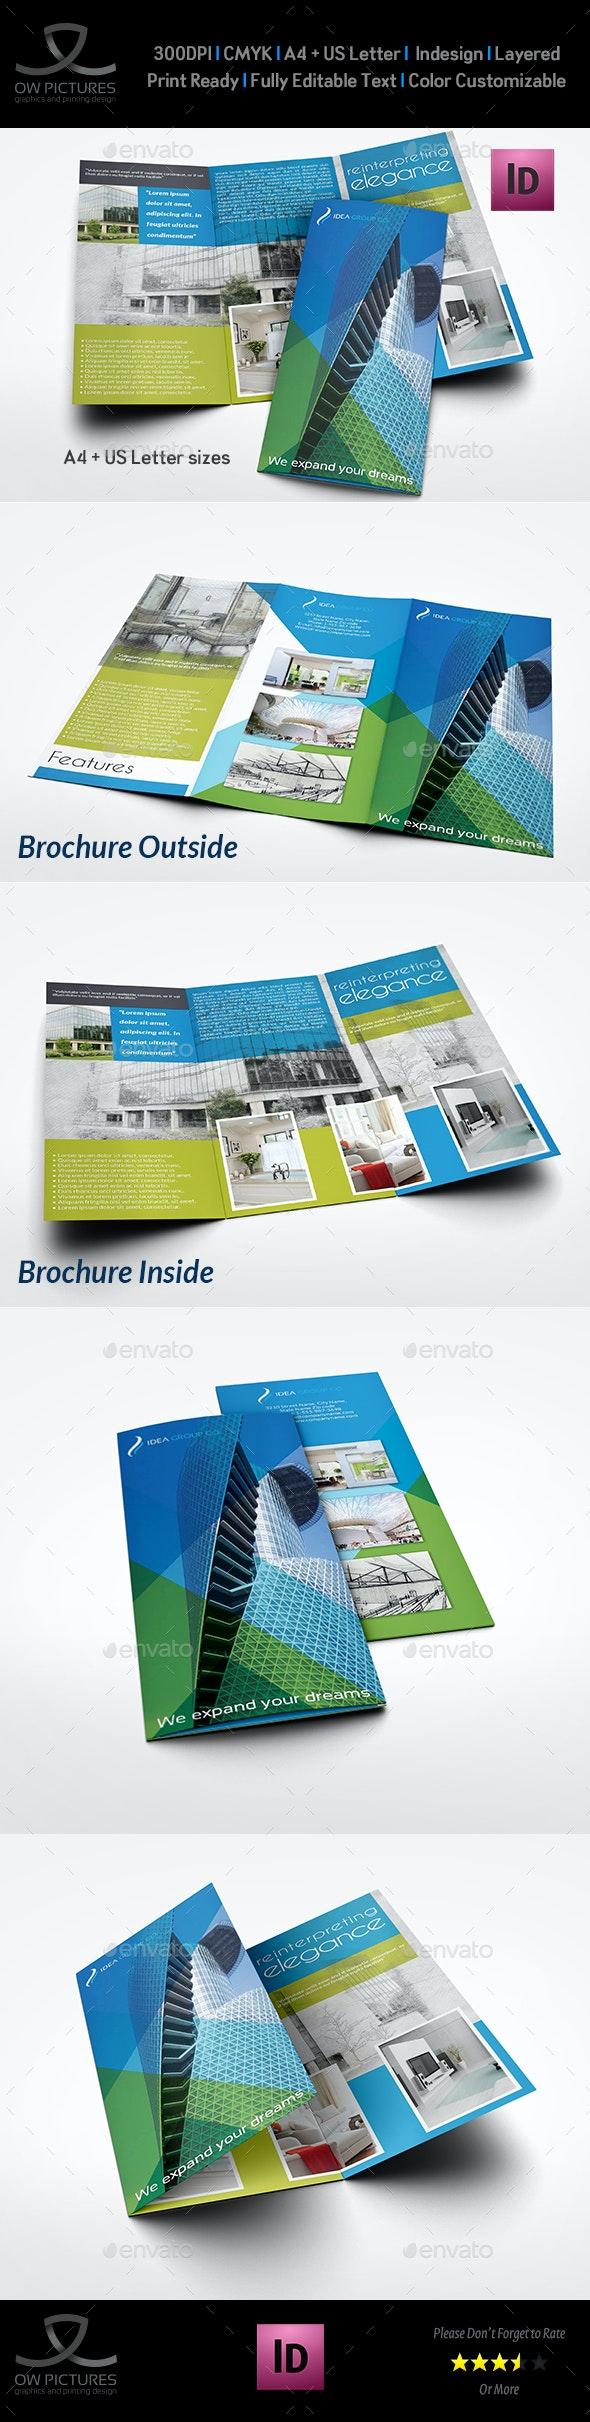 Architectural Design Tri-Fold Brochure Template Vol.2 - Brochures Print Templates